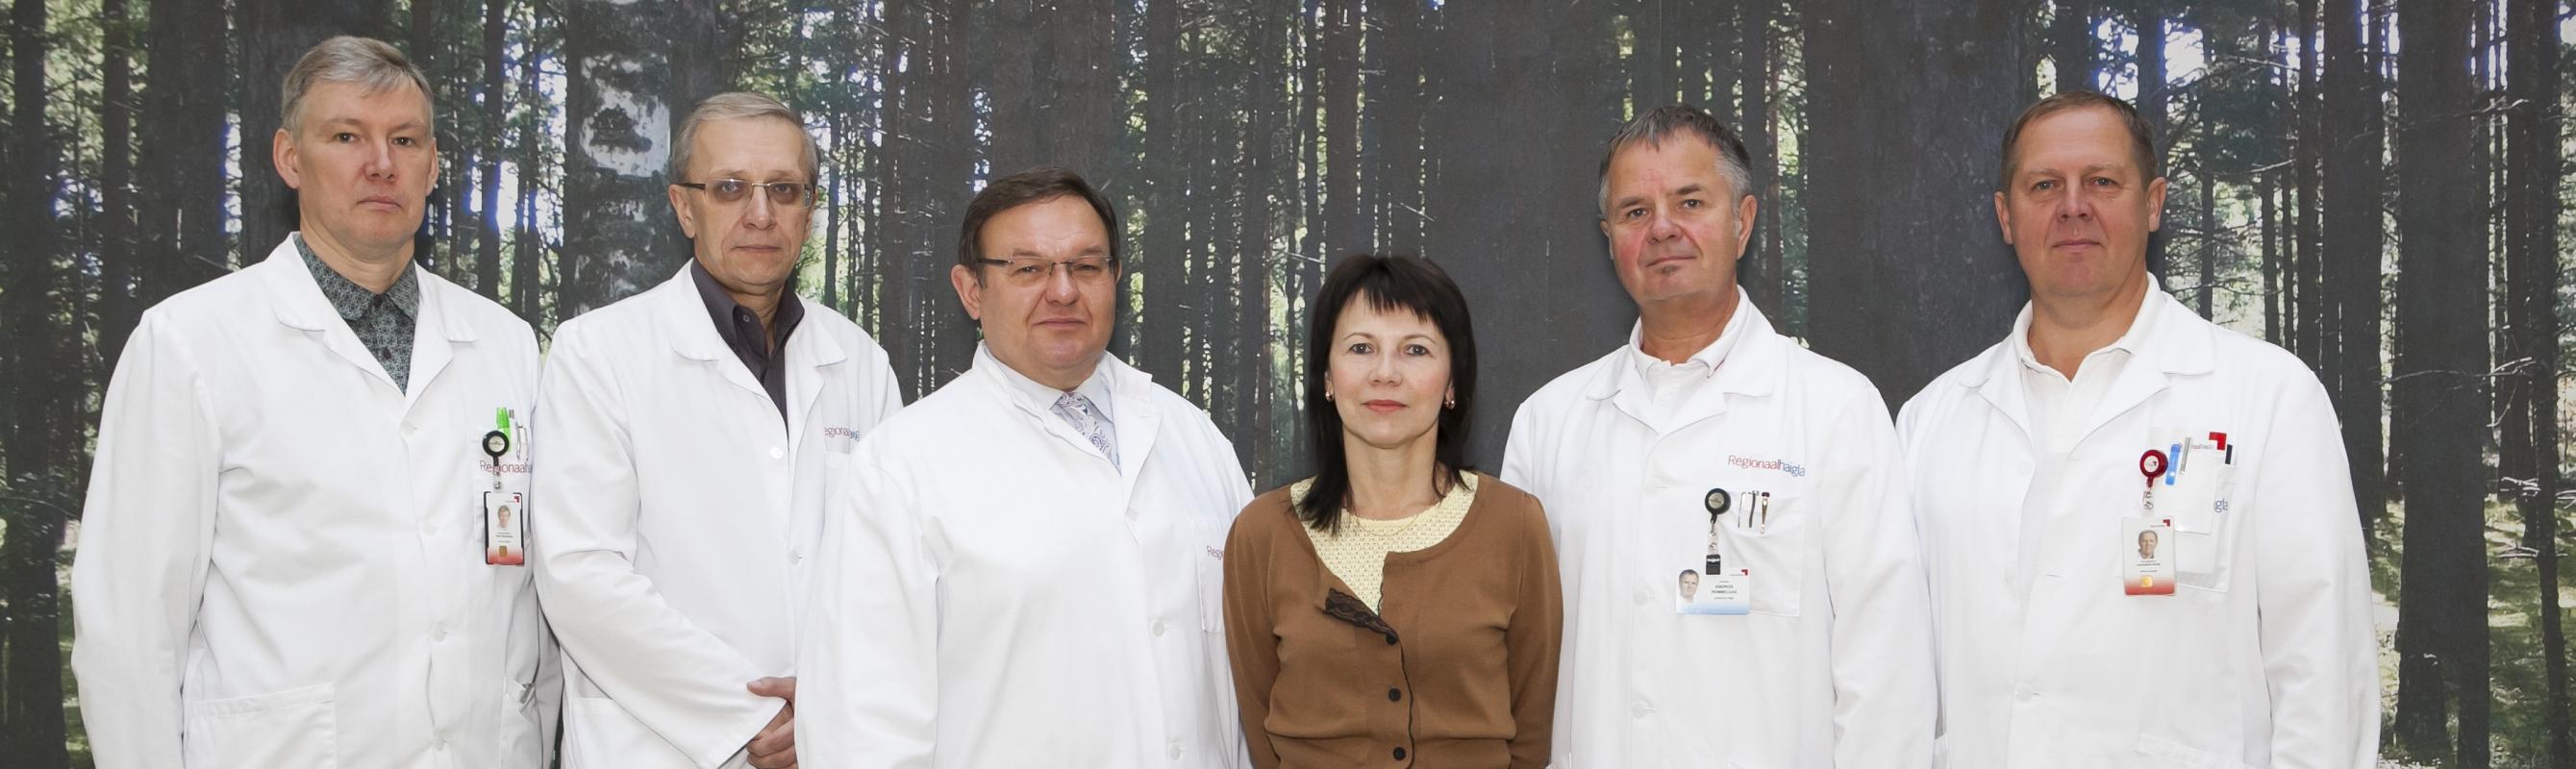 Vähiravi kvaliteedikomisjon. Pildil vasakult: dr Rein Raudsepp, dr Vahur Valvere, dr Sergei Nazarenko, dr Marina Kaarna, dr Andrus Remmelgas, dr Leonhard Kukk